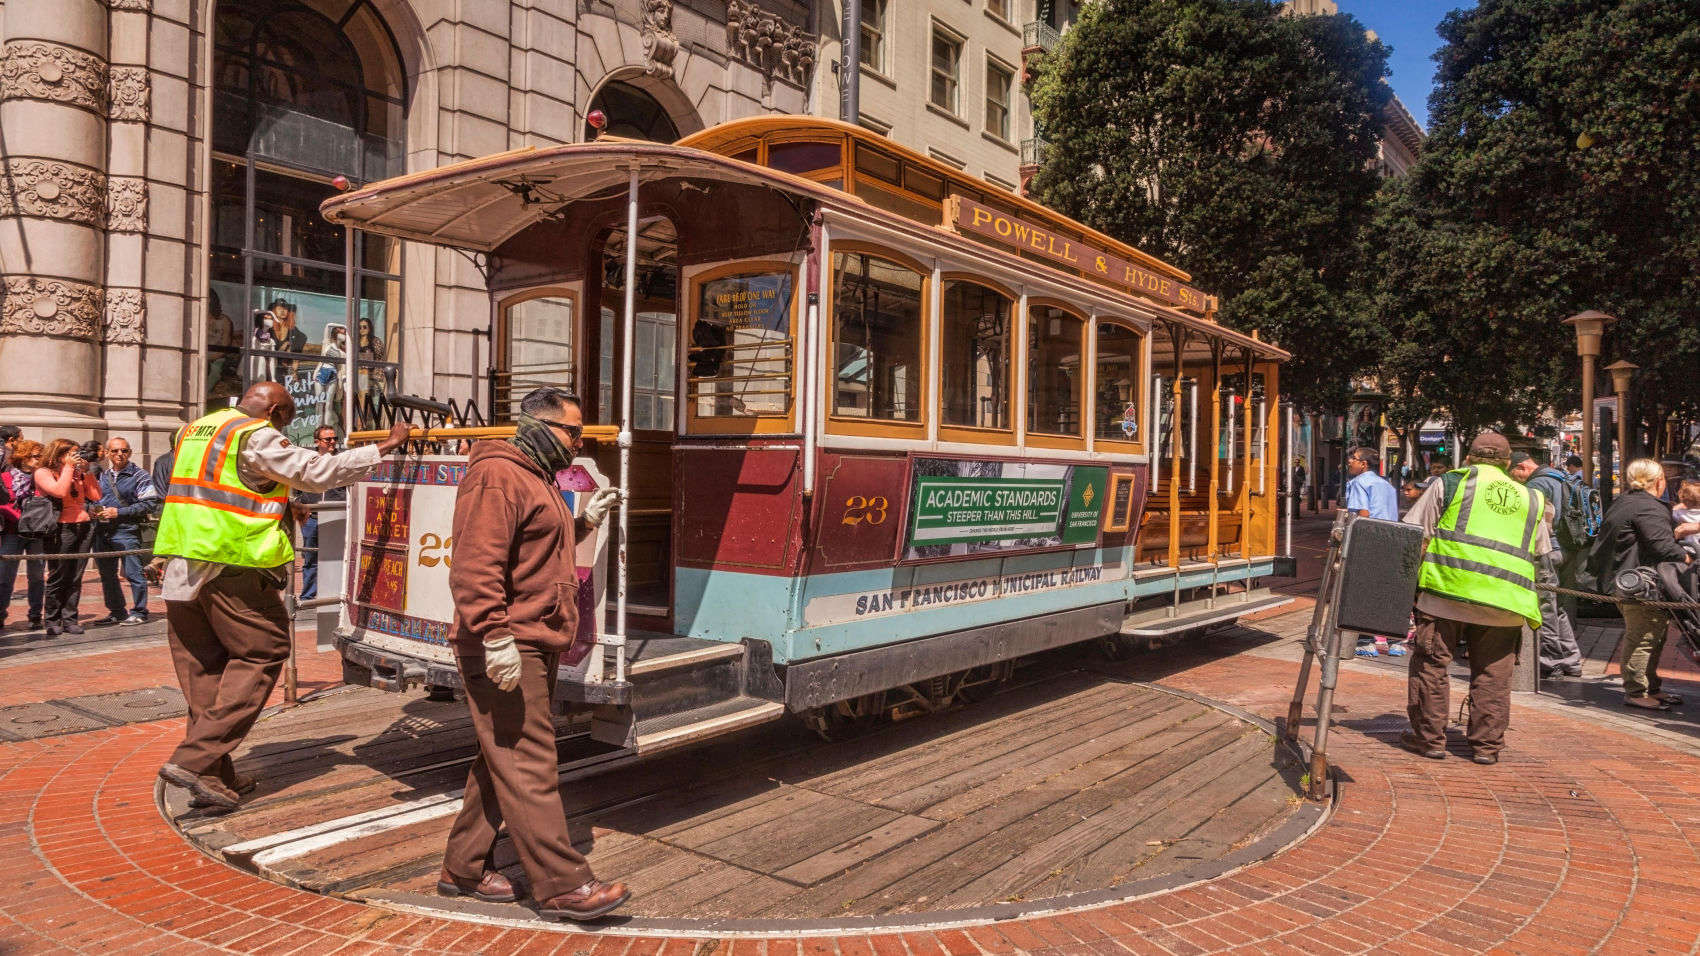 Top 10 San Francisco Hotels Near Powell